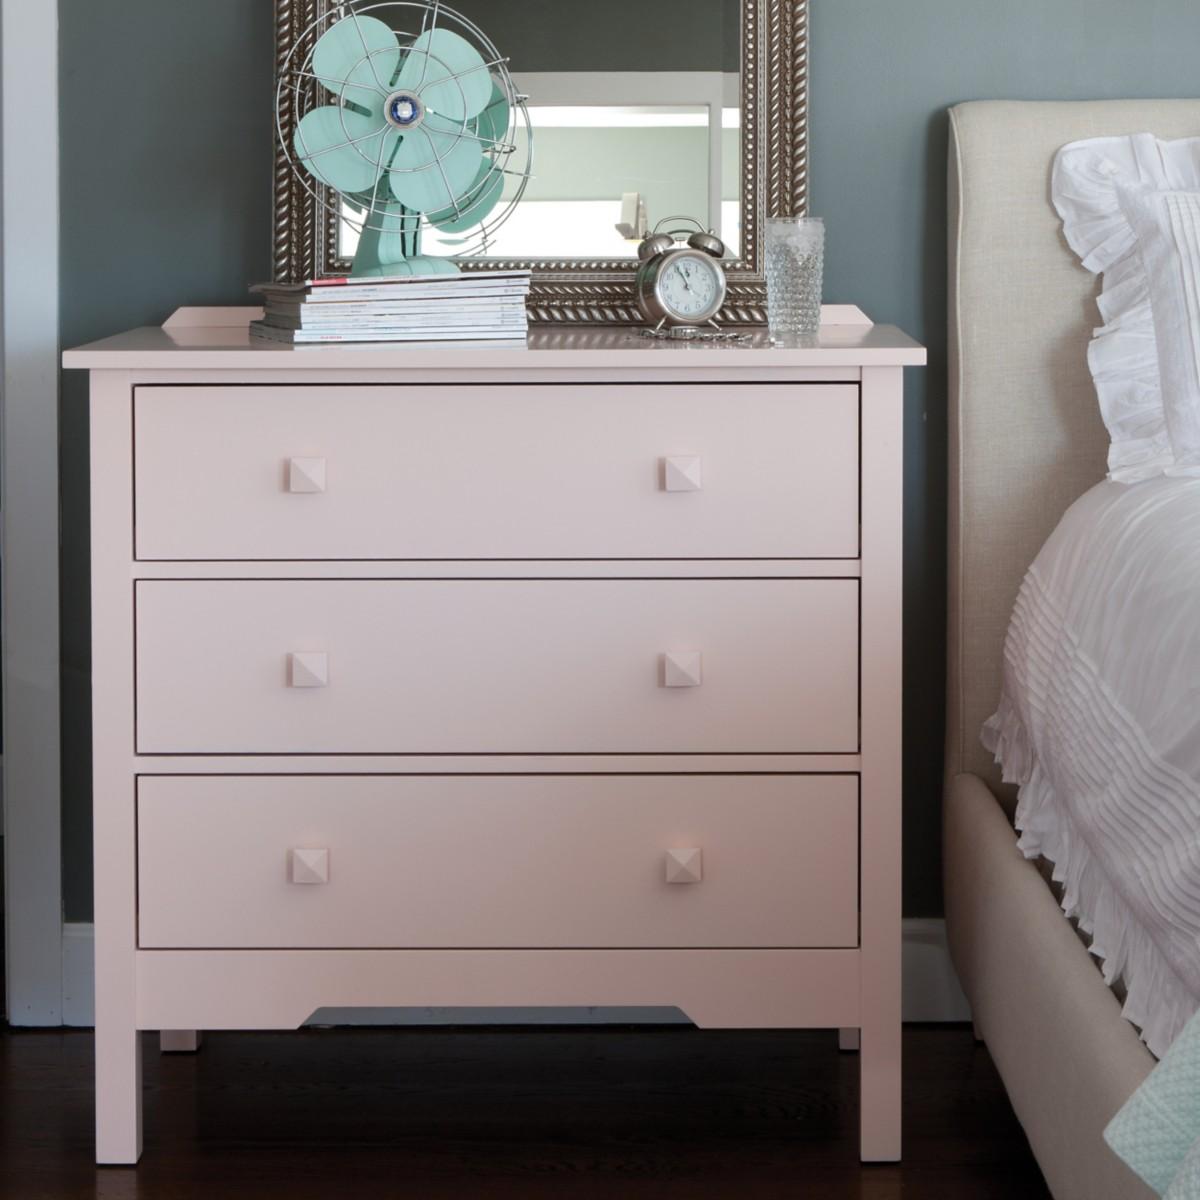 for key ikea greek drawer dresserweb o kit overlays gk hemnes dresser verlays product